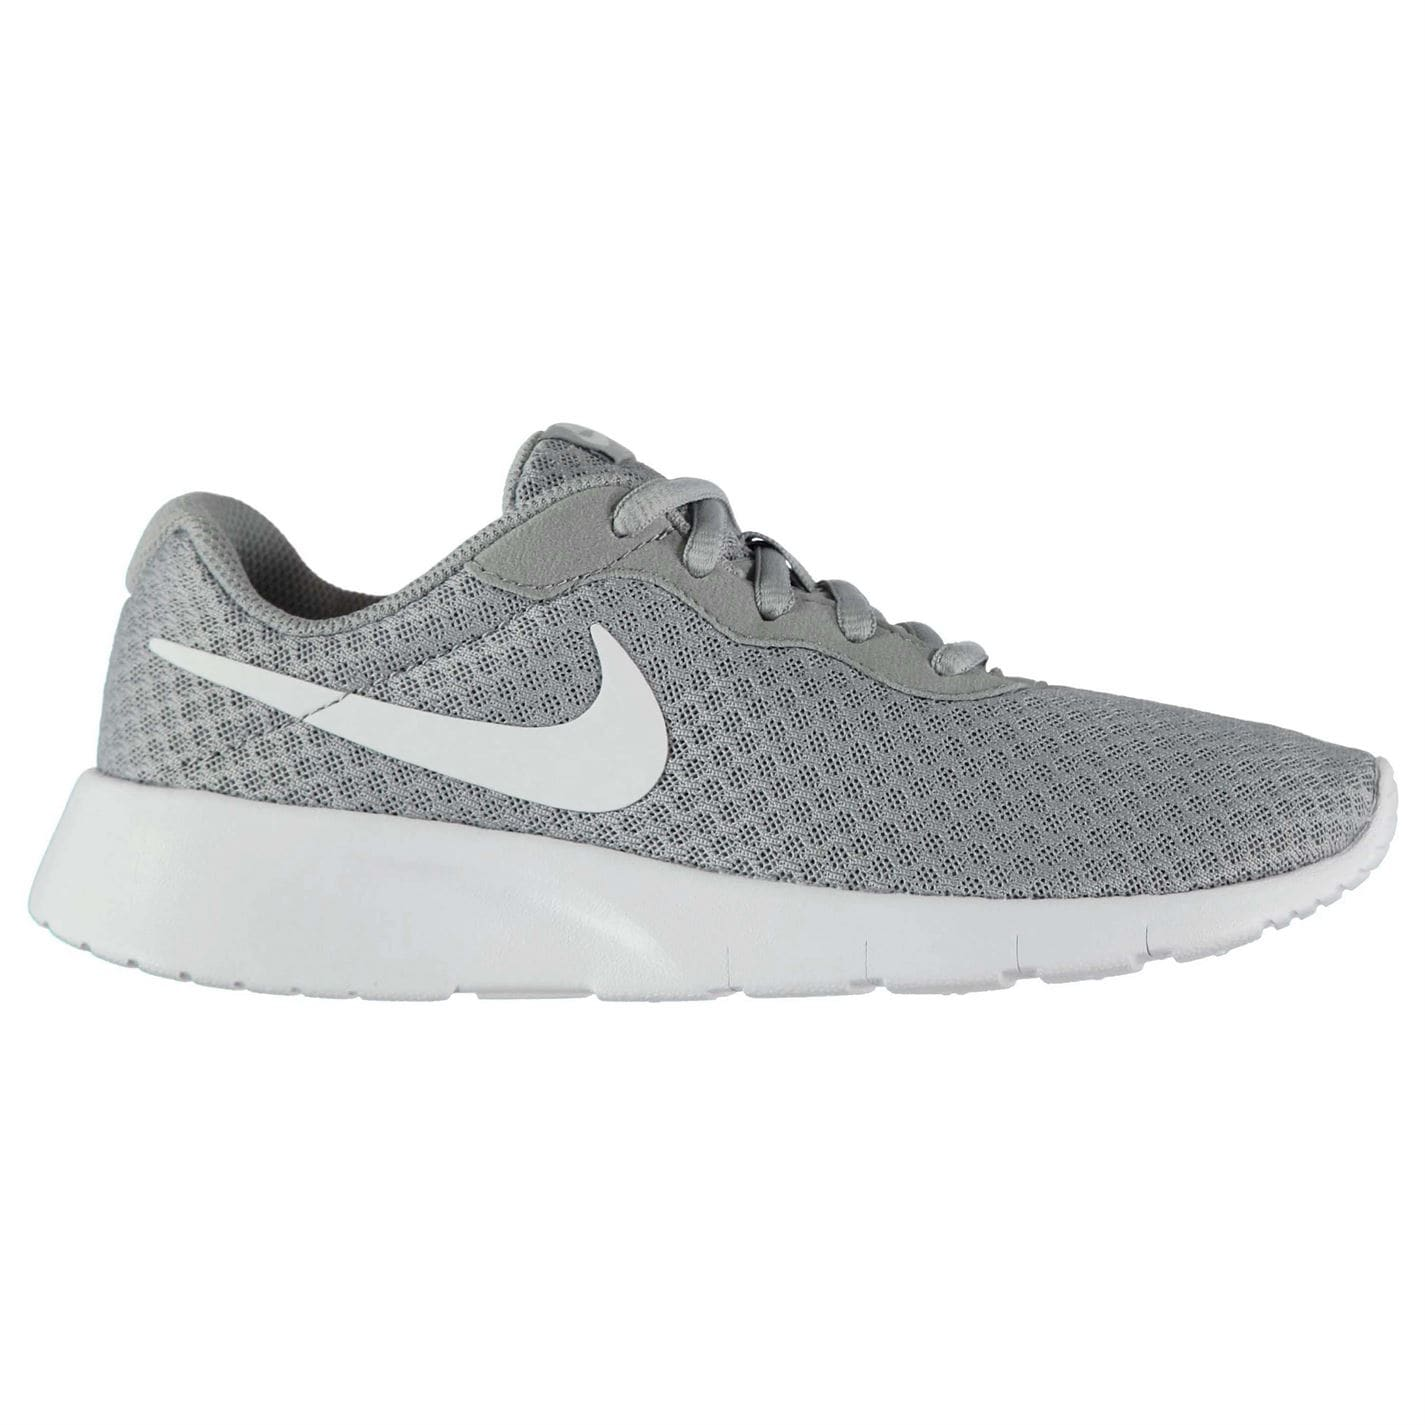 Nike Tanjun Little Kids Shoe WOLF GREY/WHITE-WHITE